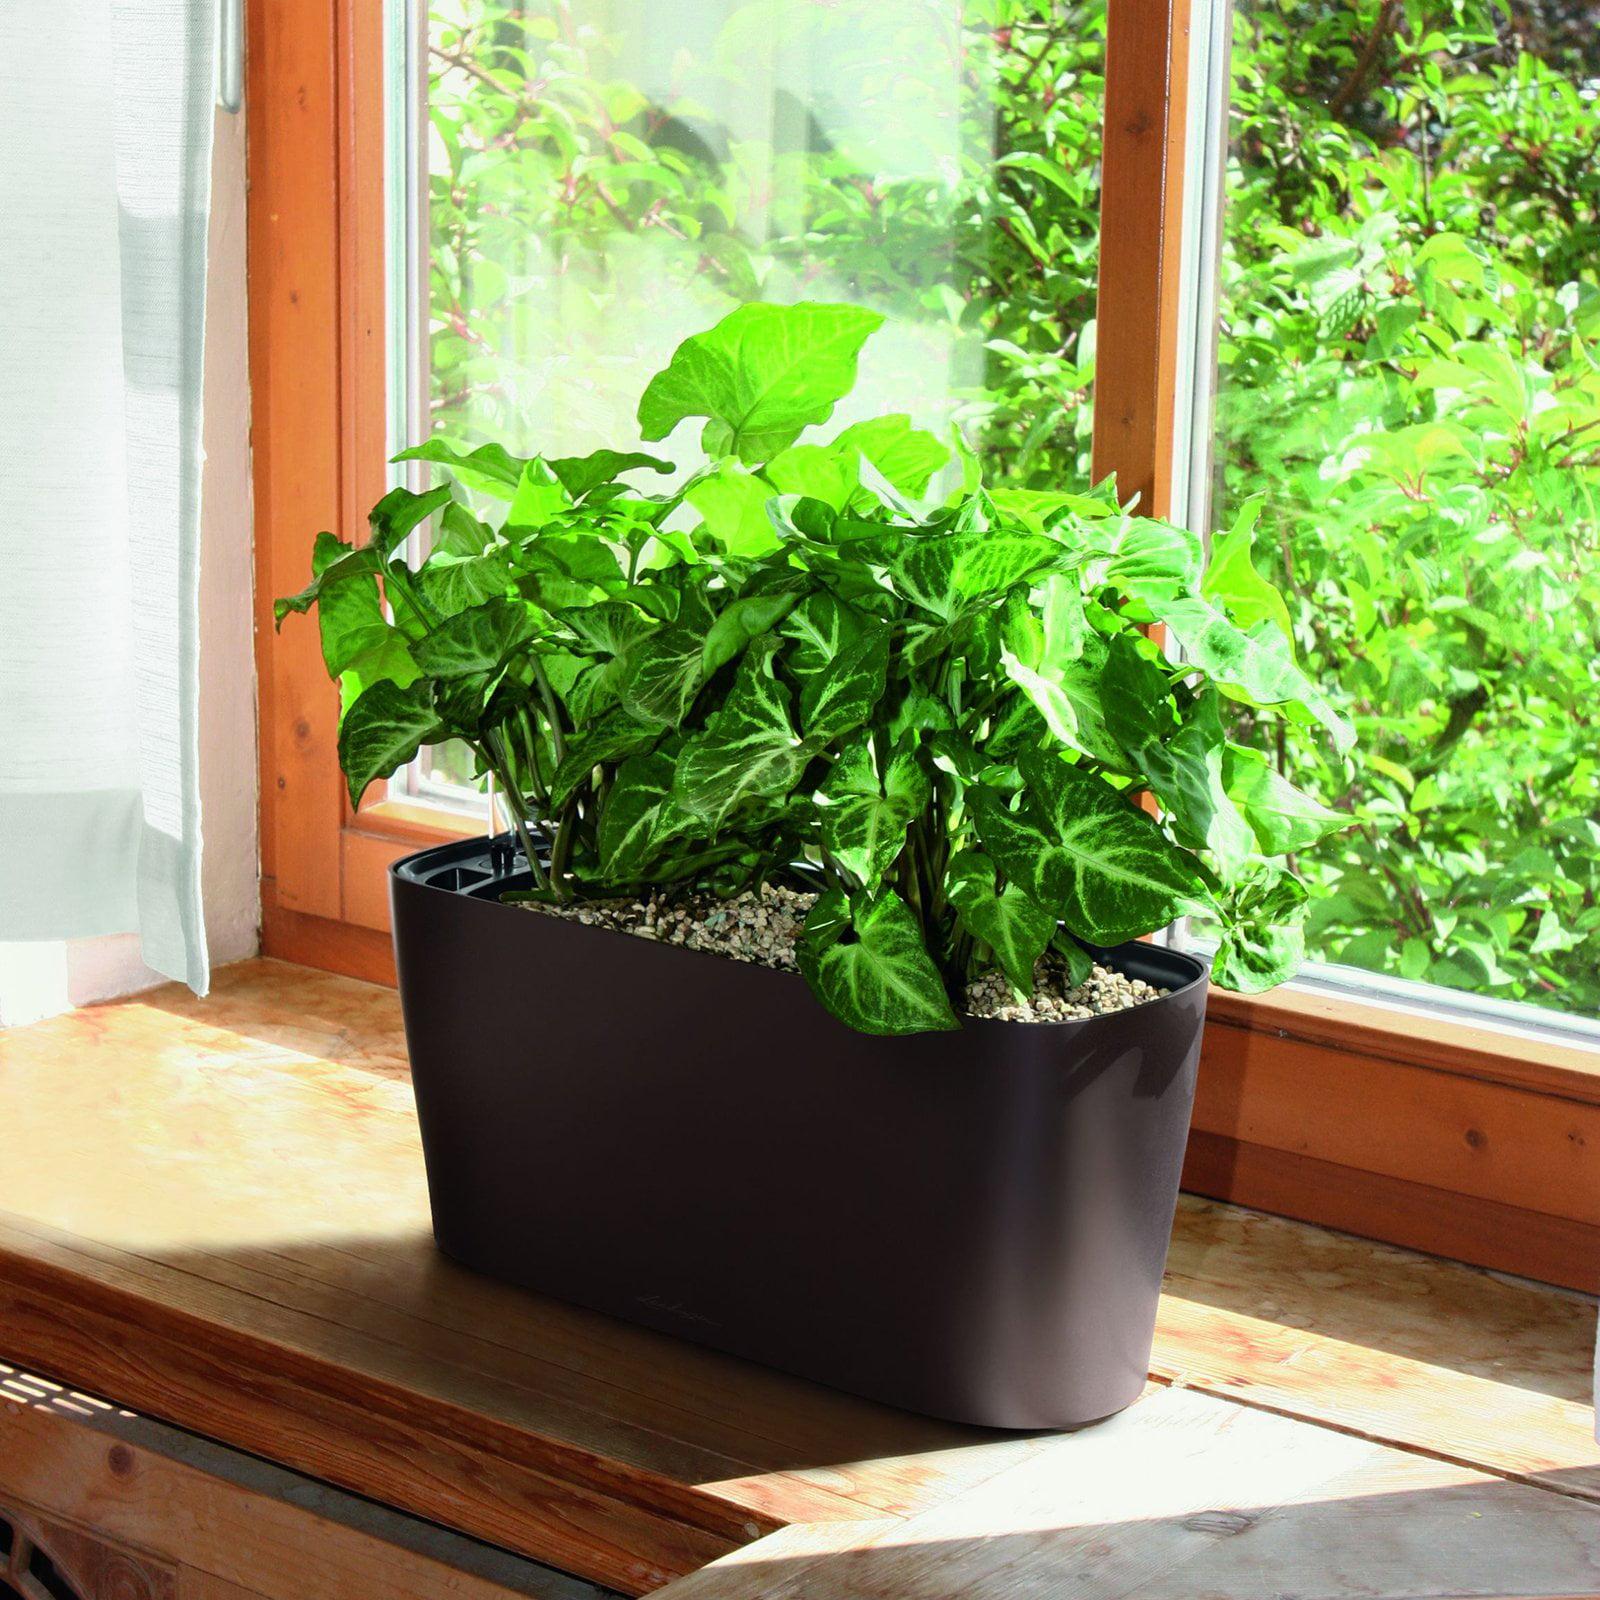 Lechuza Windowsill Self-Watering Indoor Planter - Walmart.com